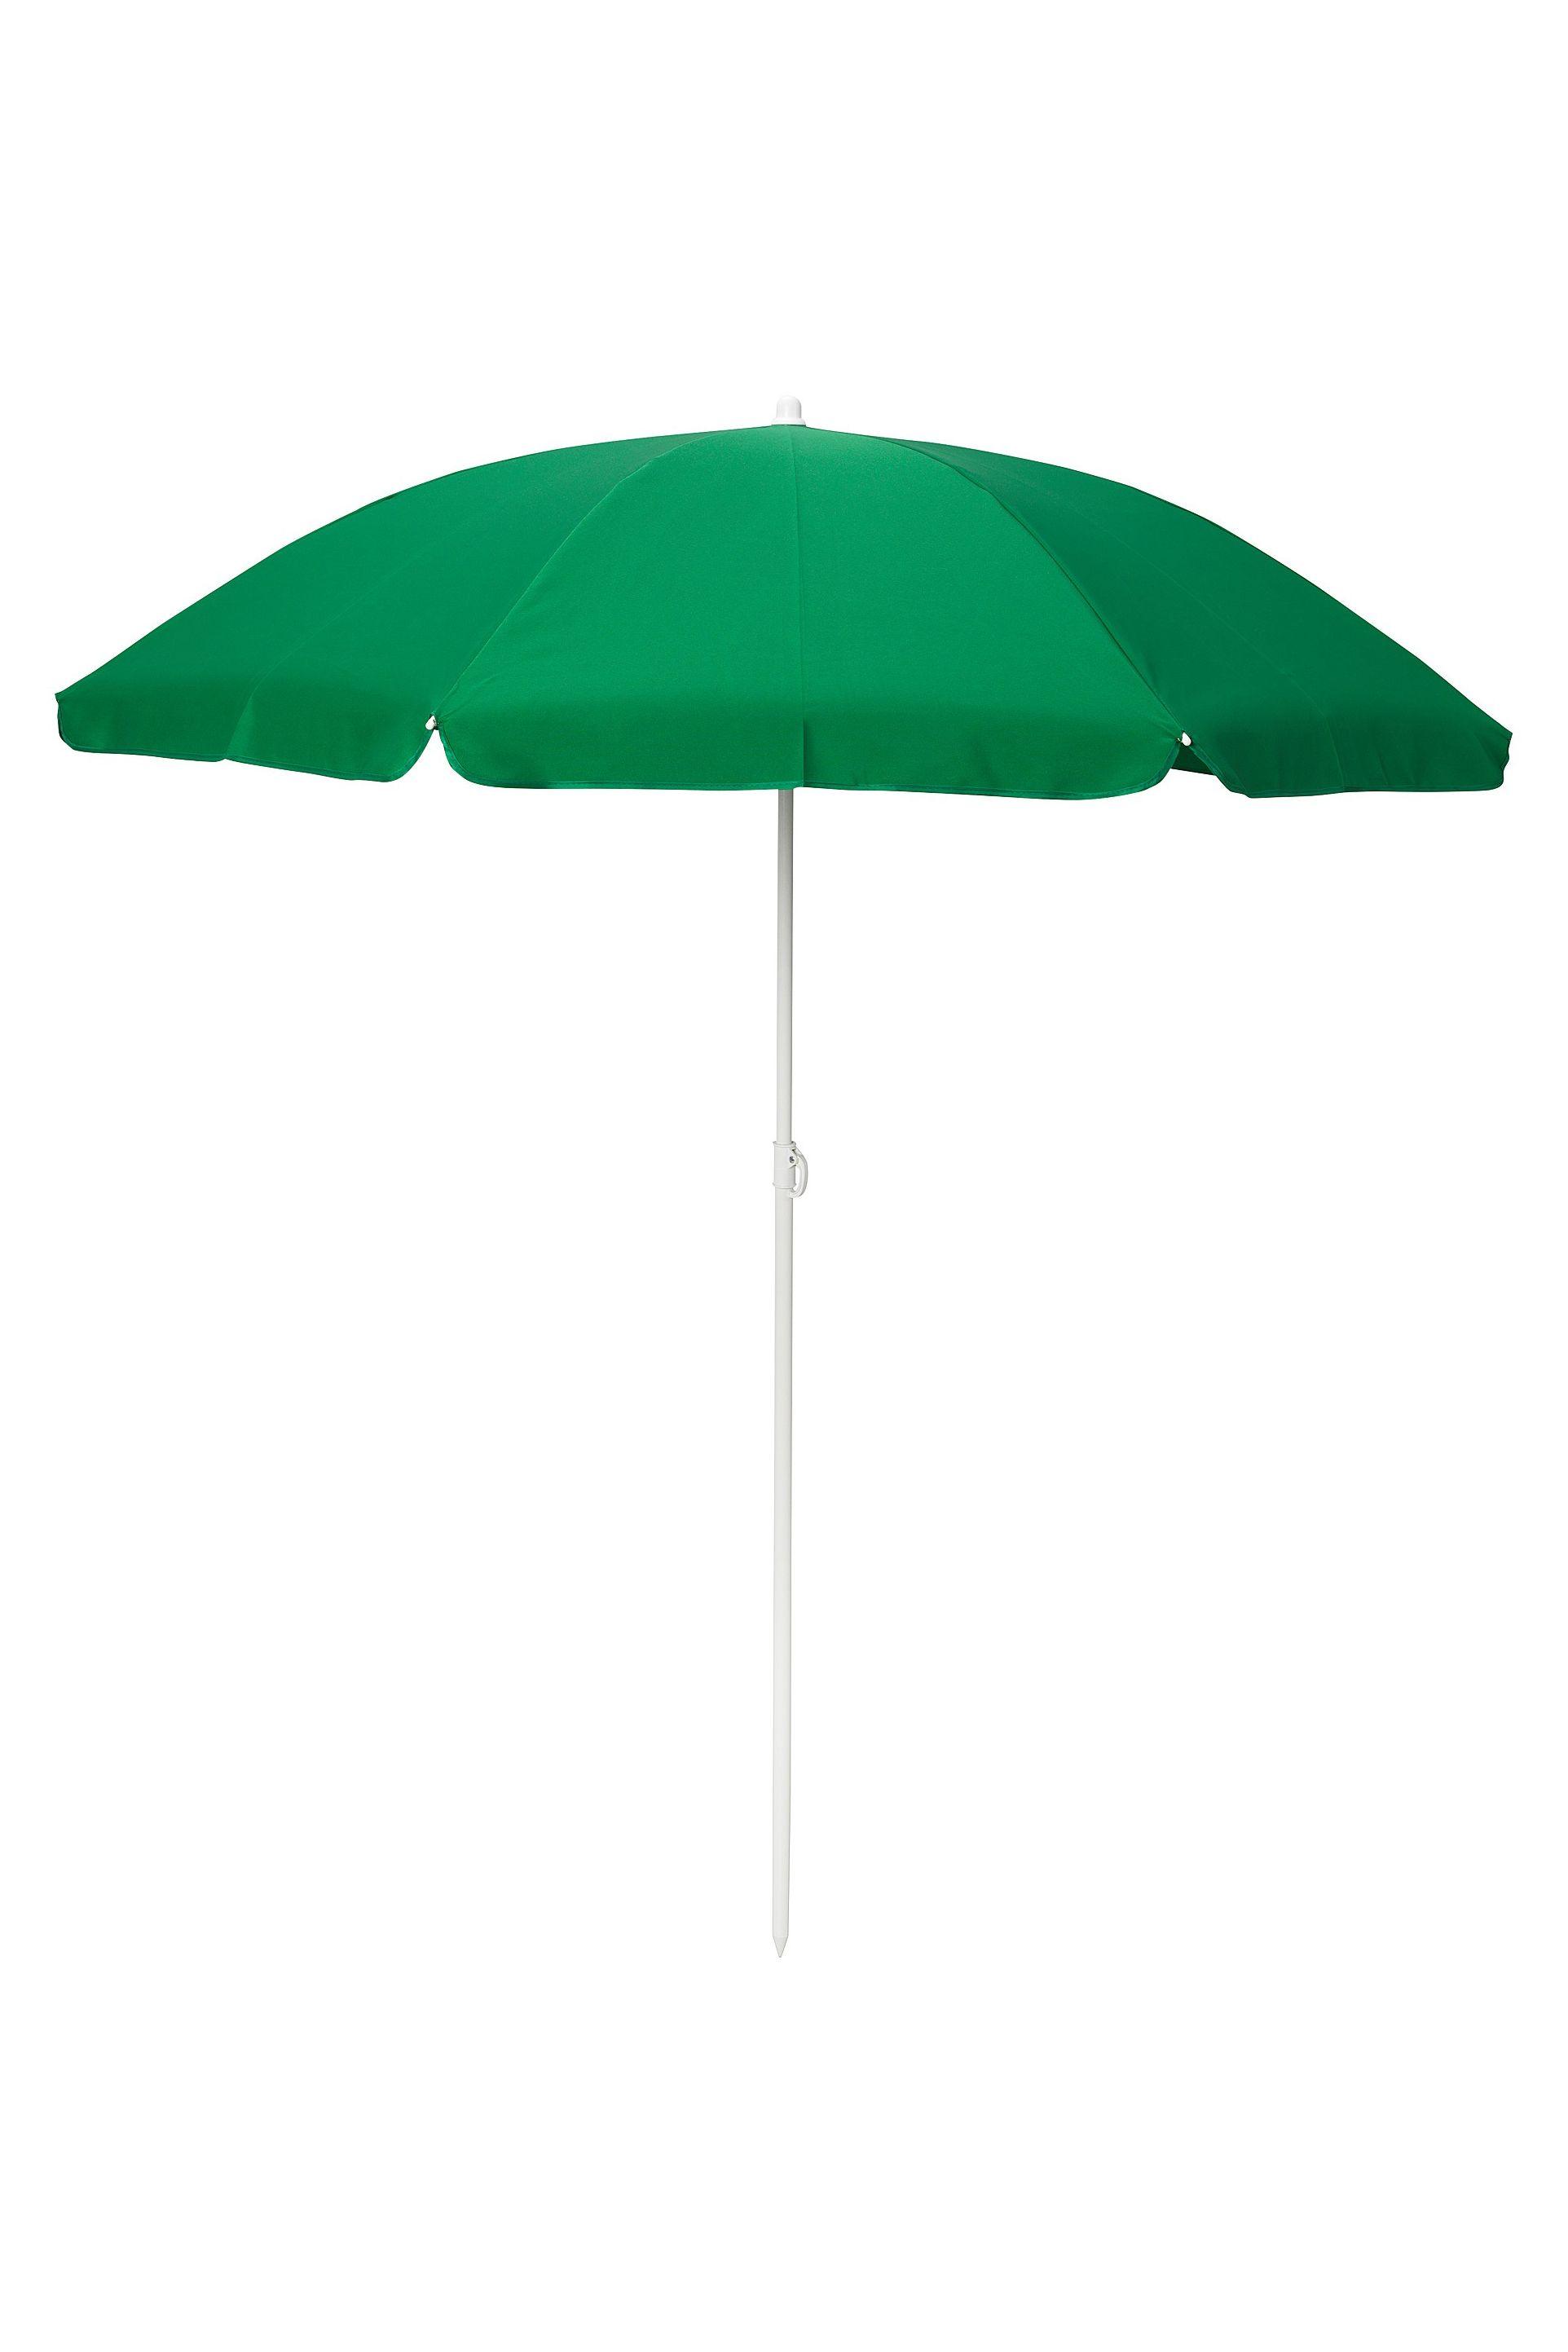 Sonnenschirm RAMSÖ verstellbar, grün in 2019 | Garten ...